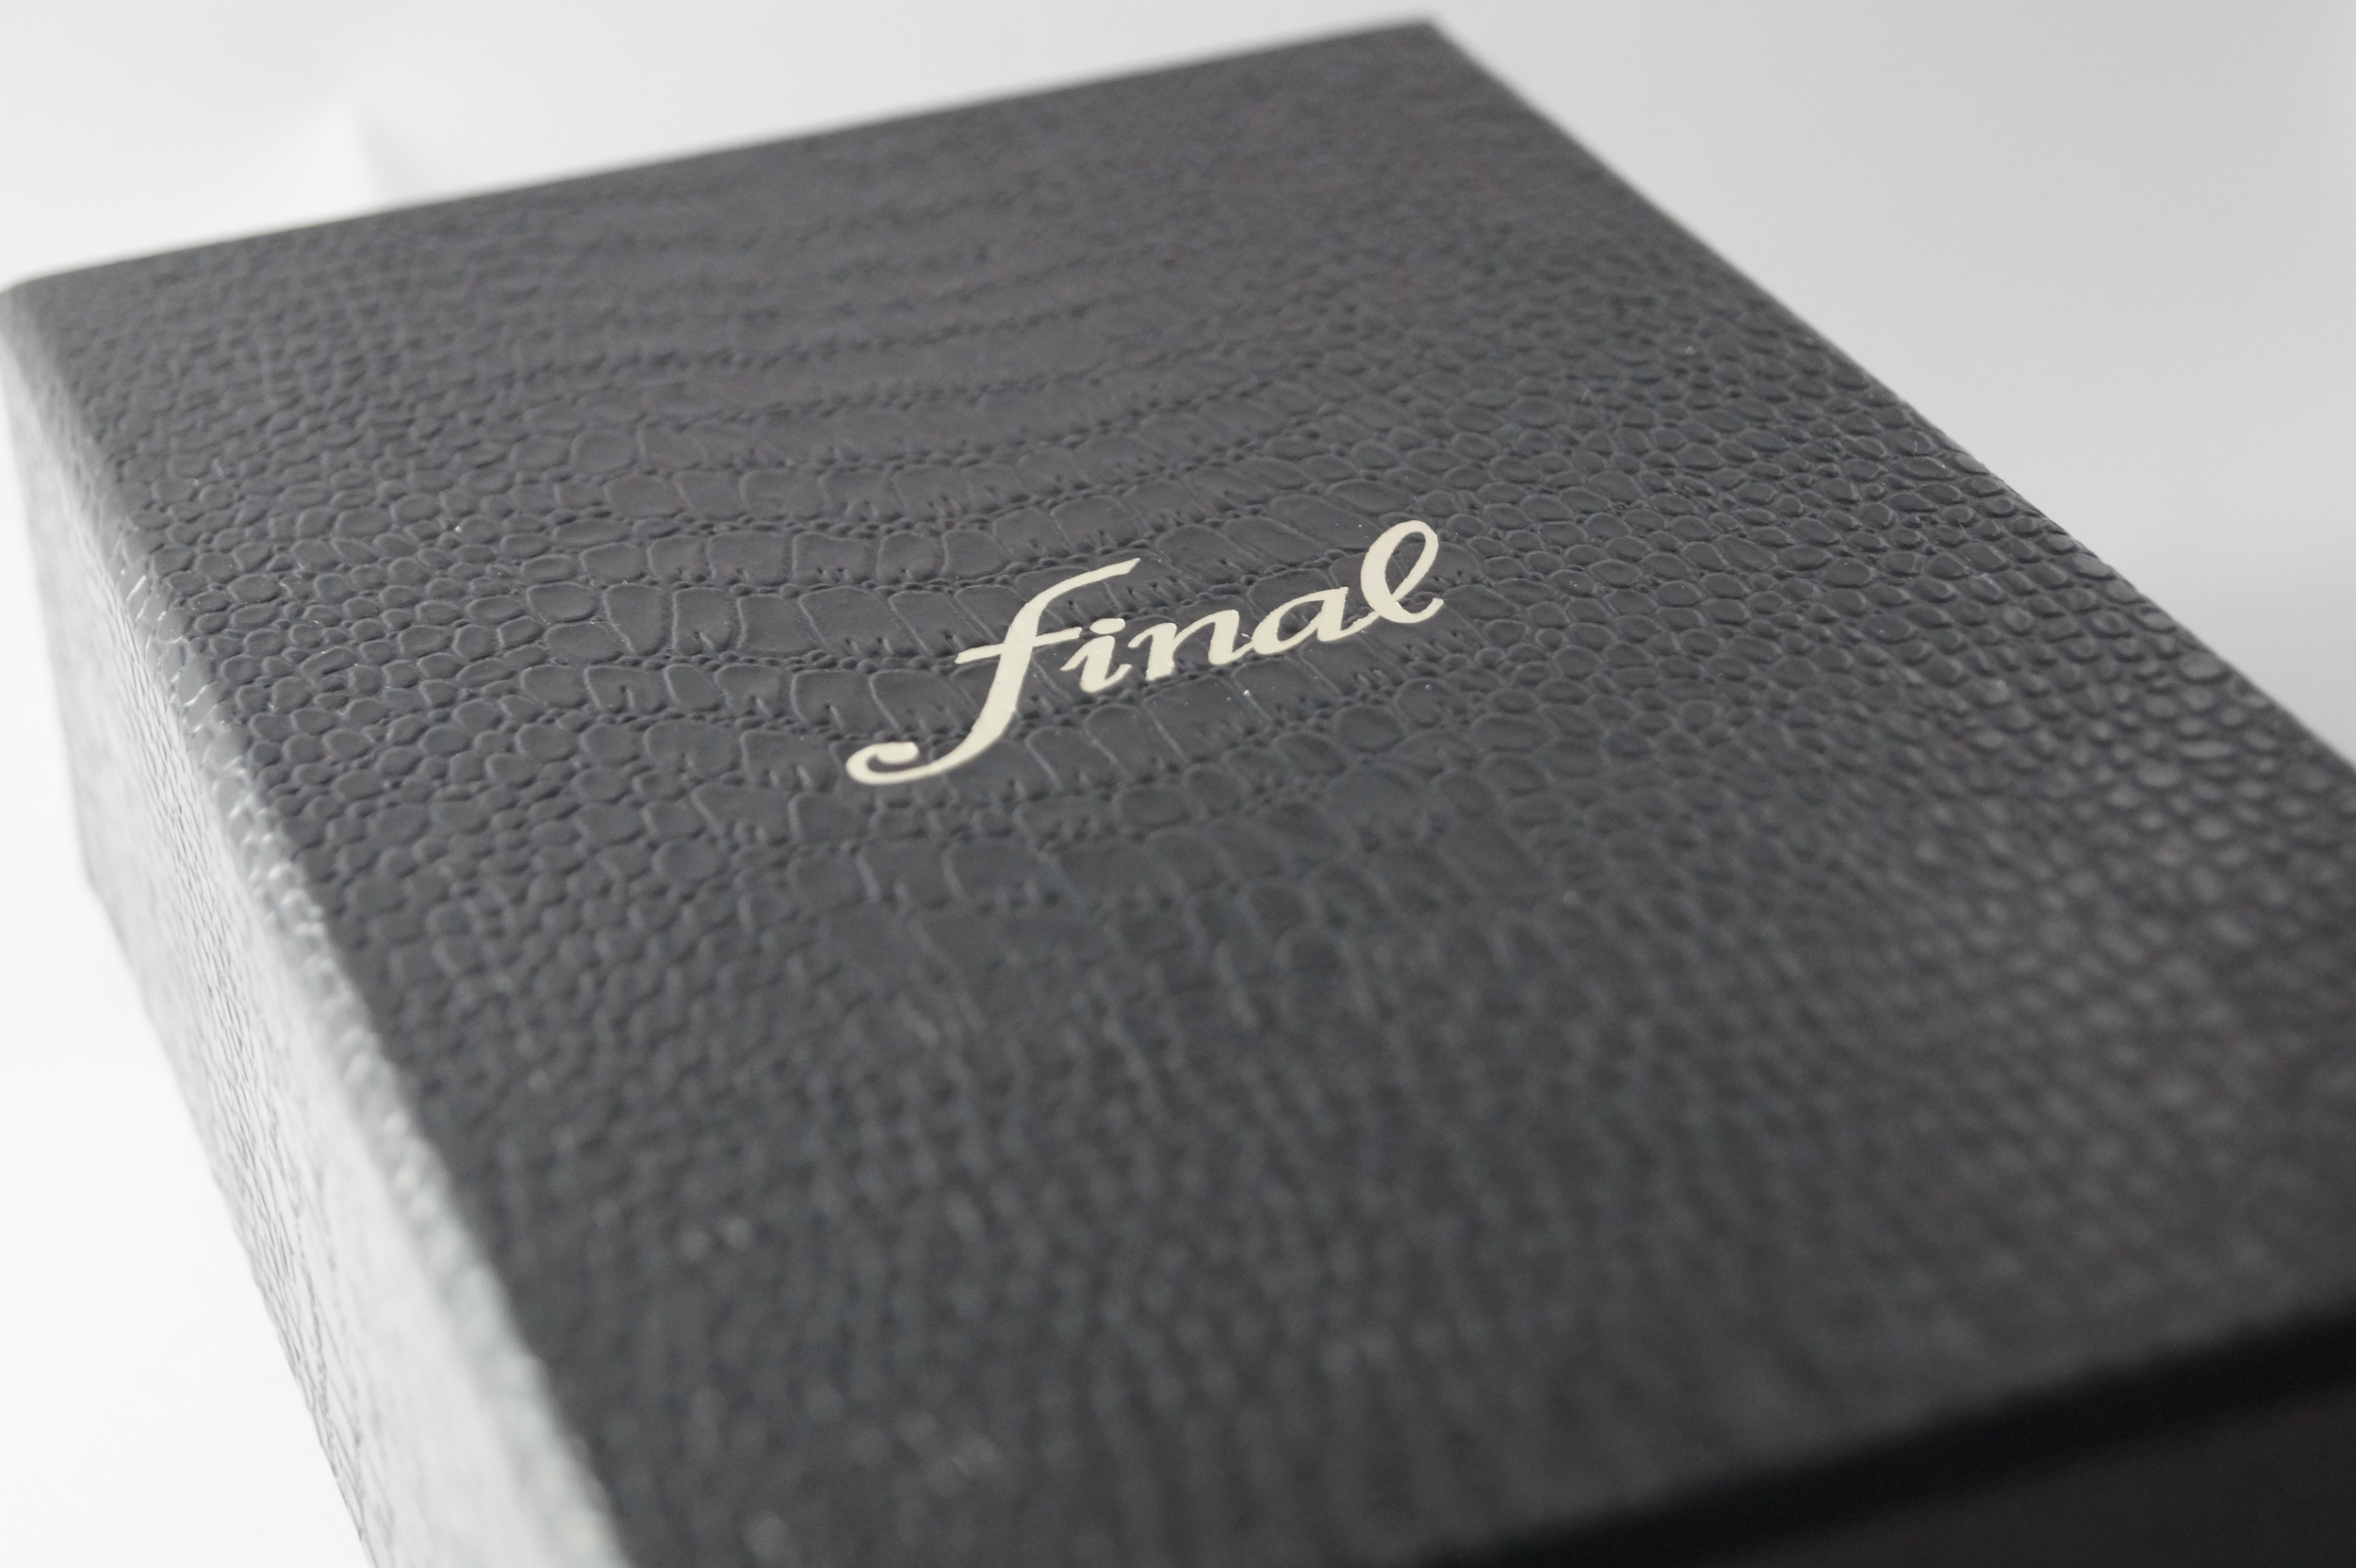 Final Audio Design FI-BA-SS review